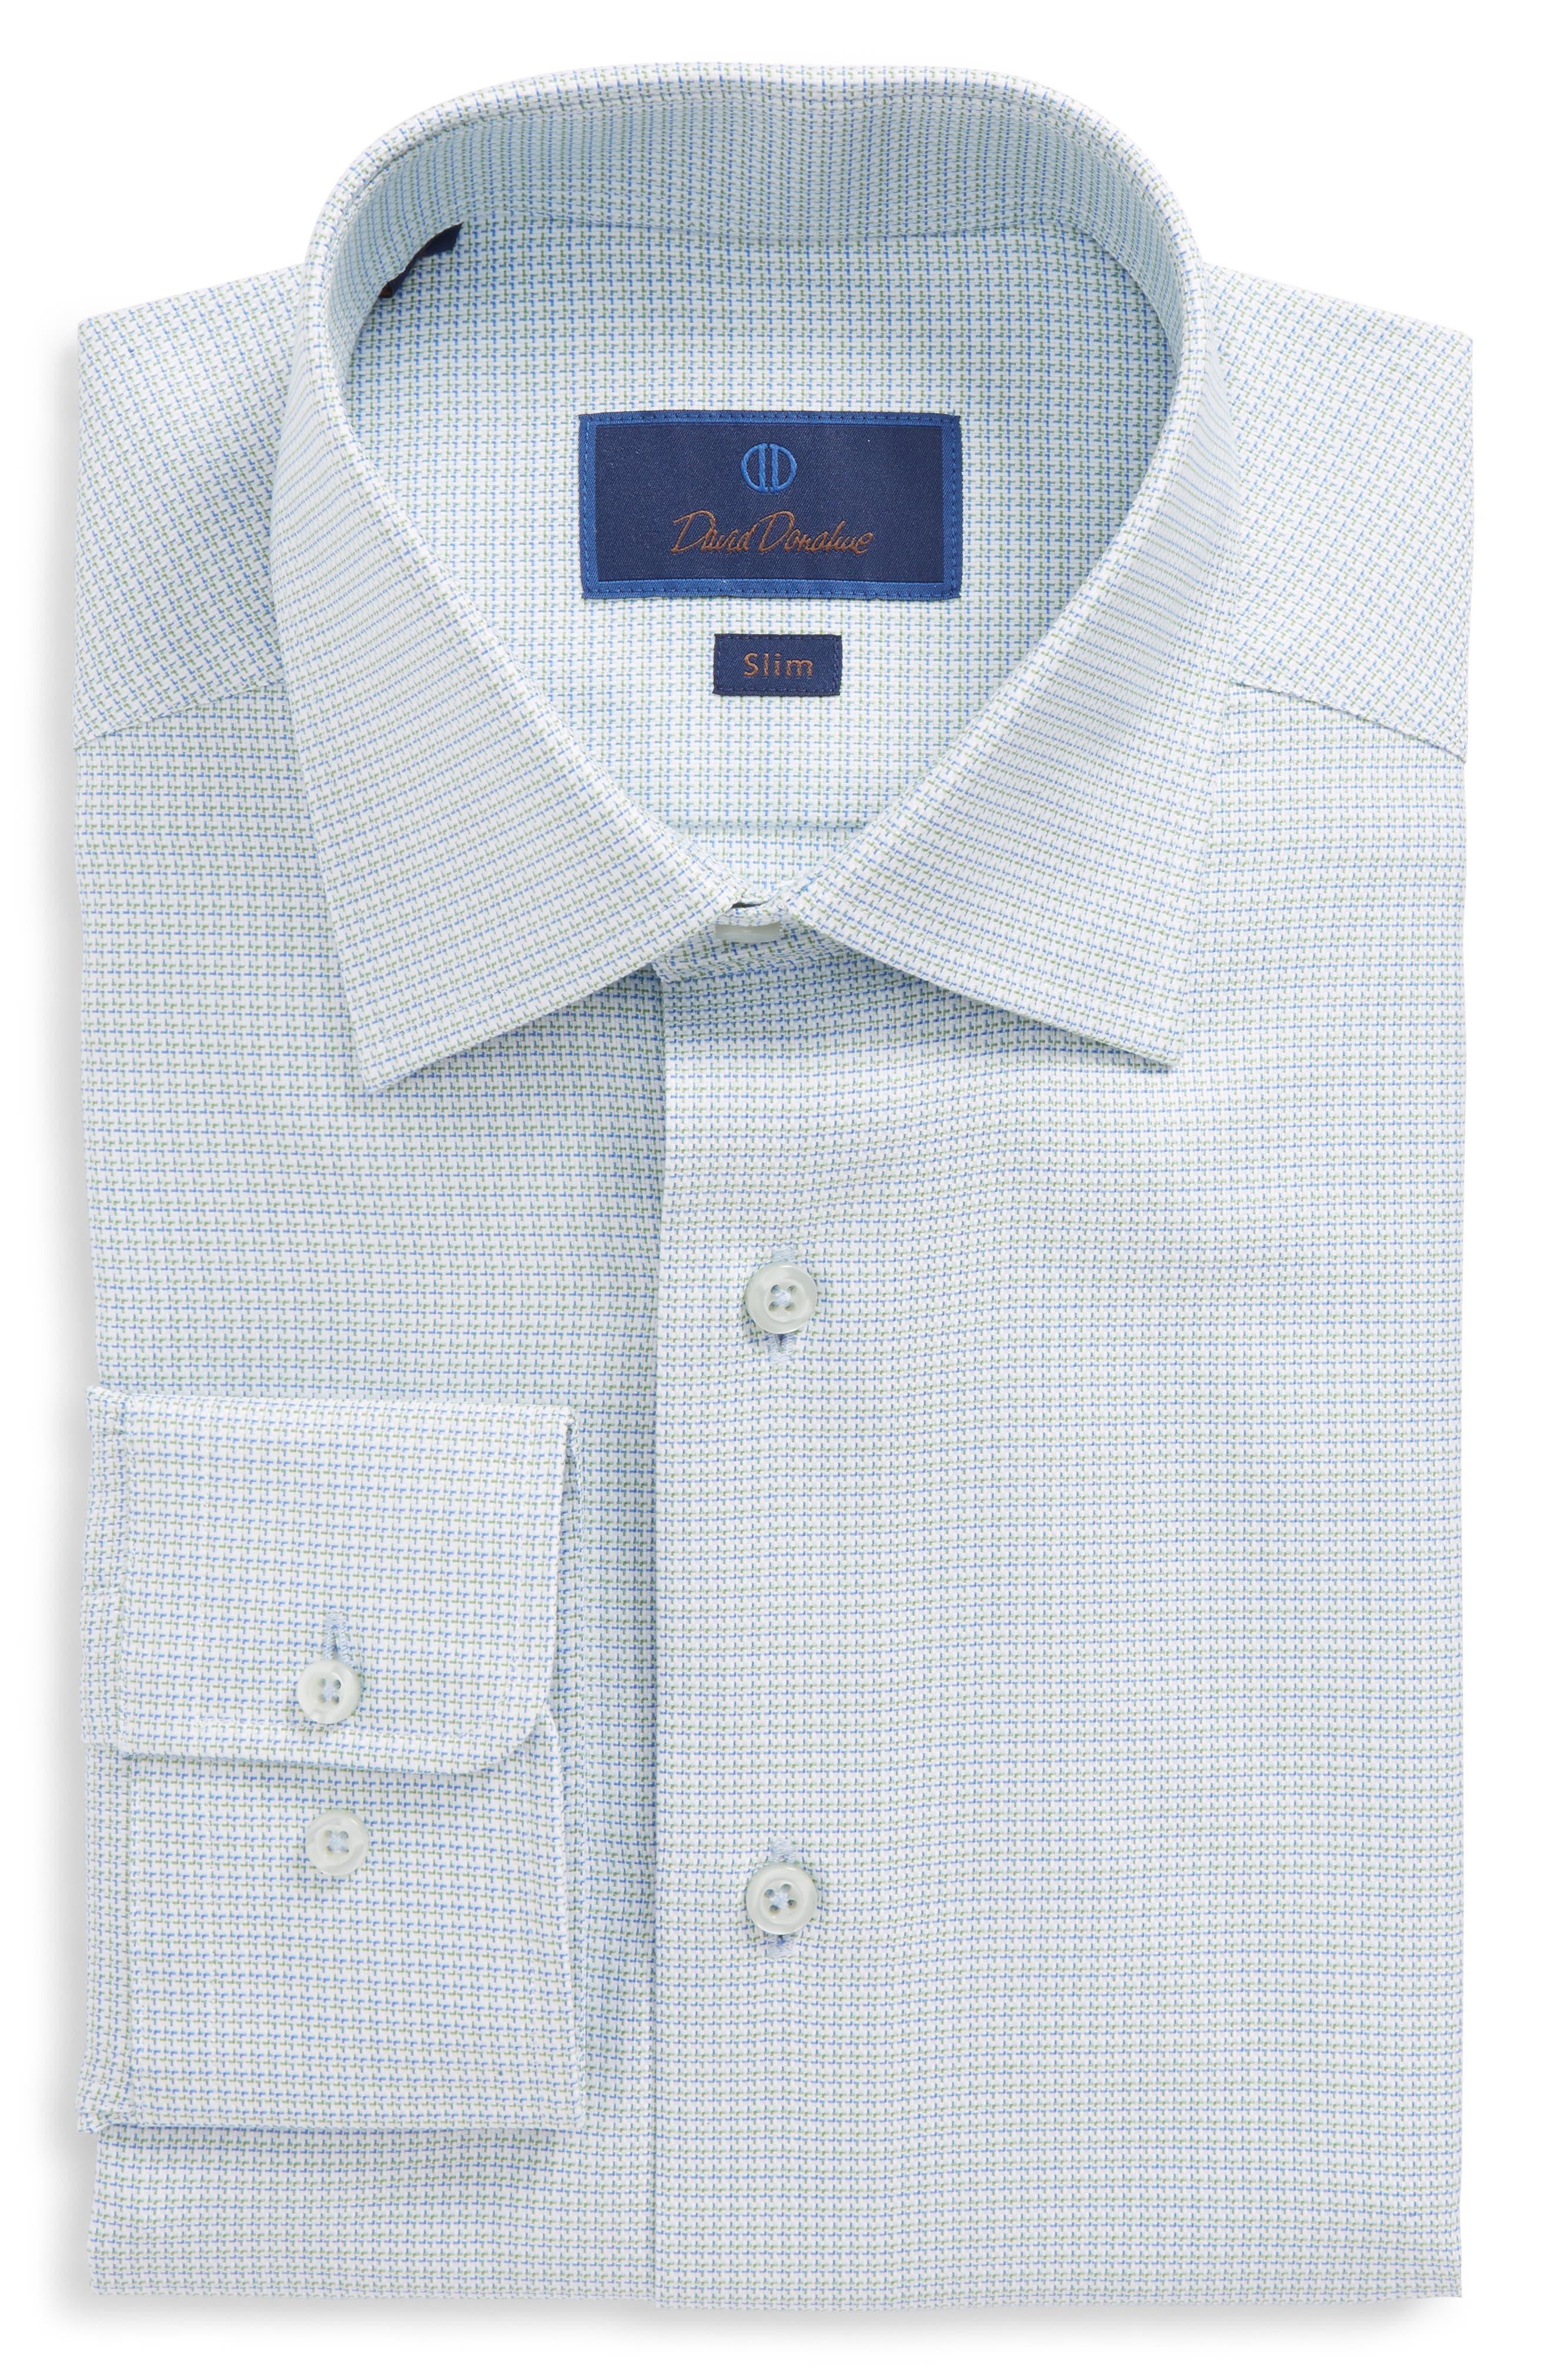 Slim Fit Solid Dress Shirt,                         Main,                         color, 310